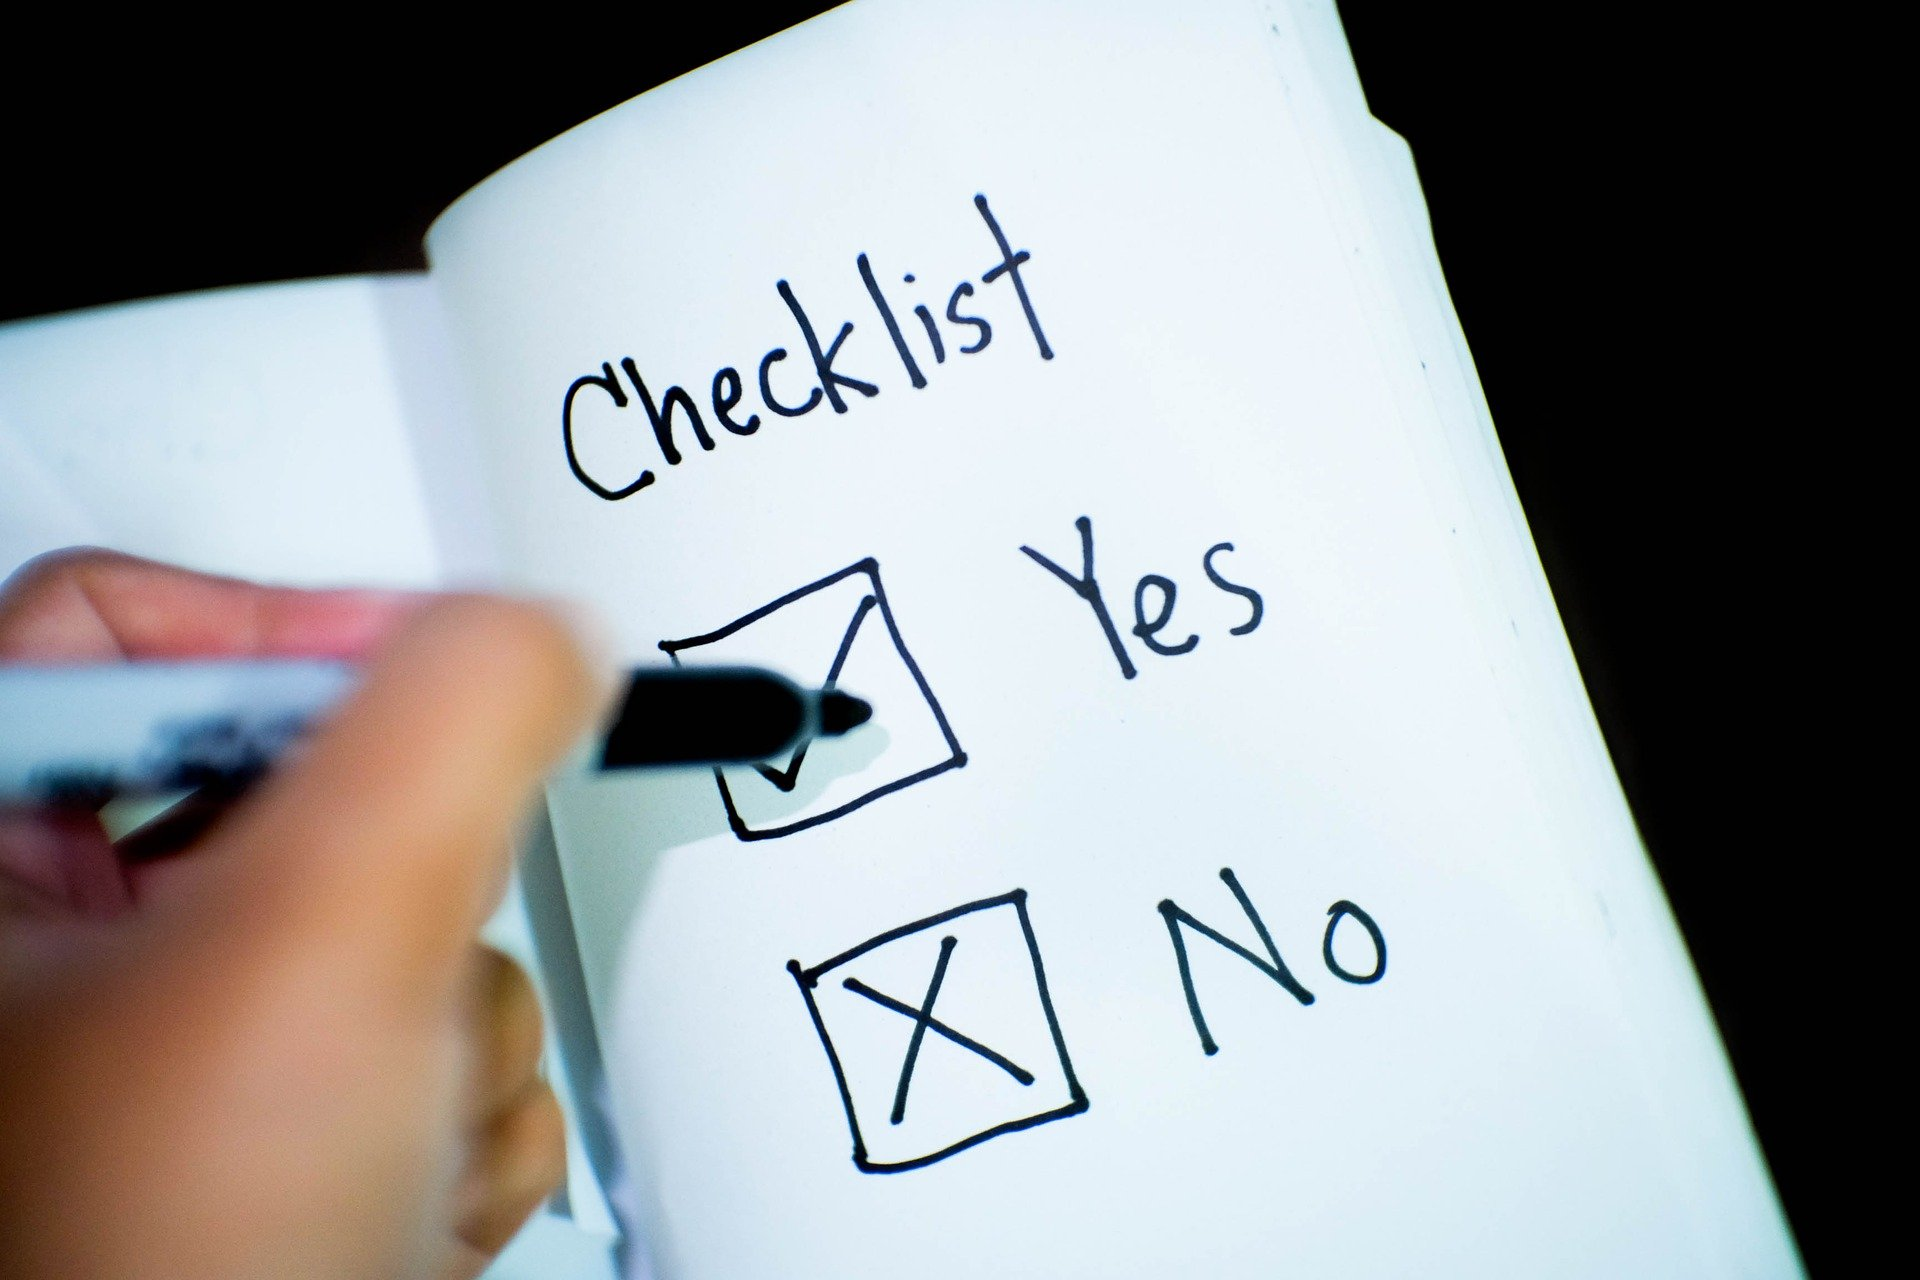 Checklist samenwerking aangaan